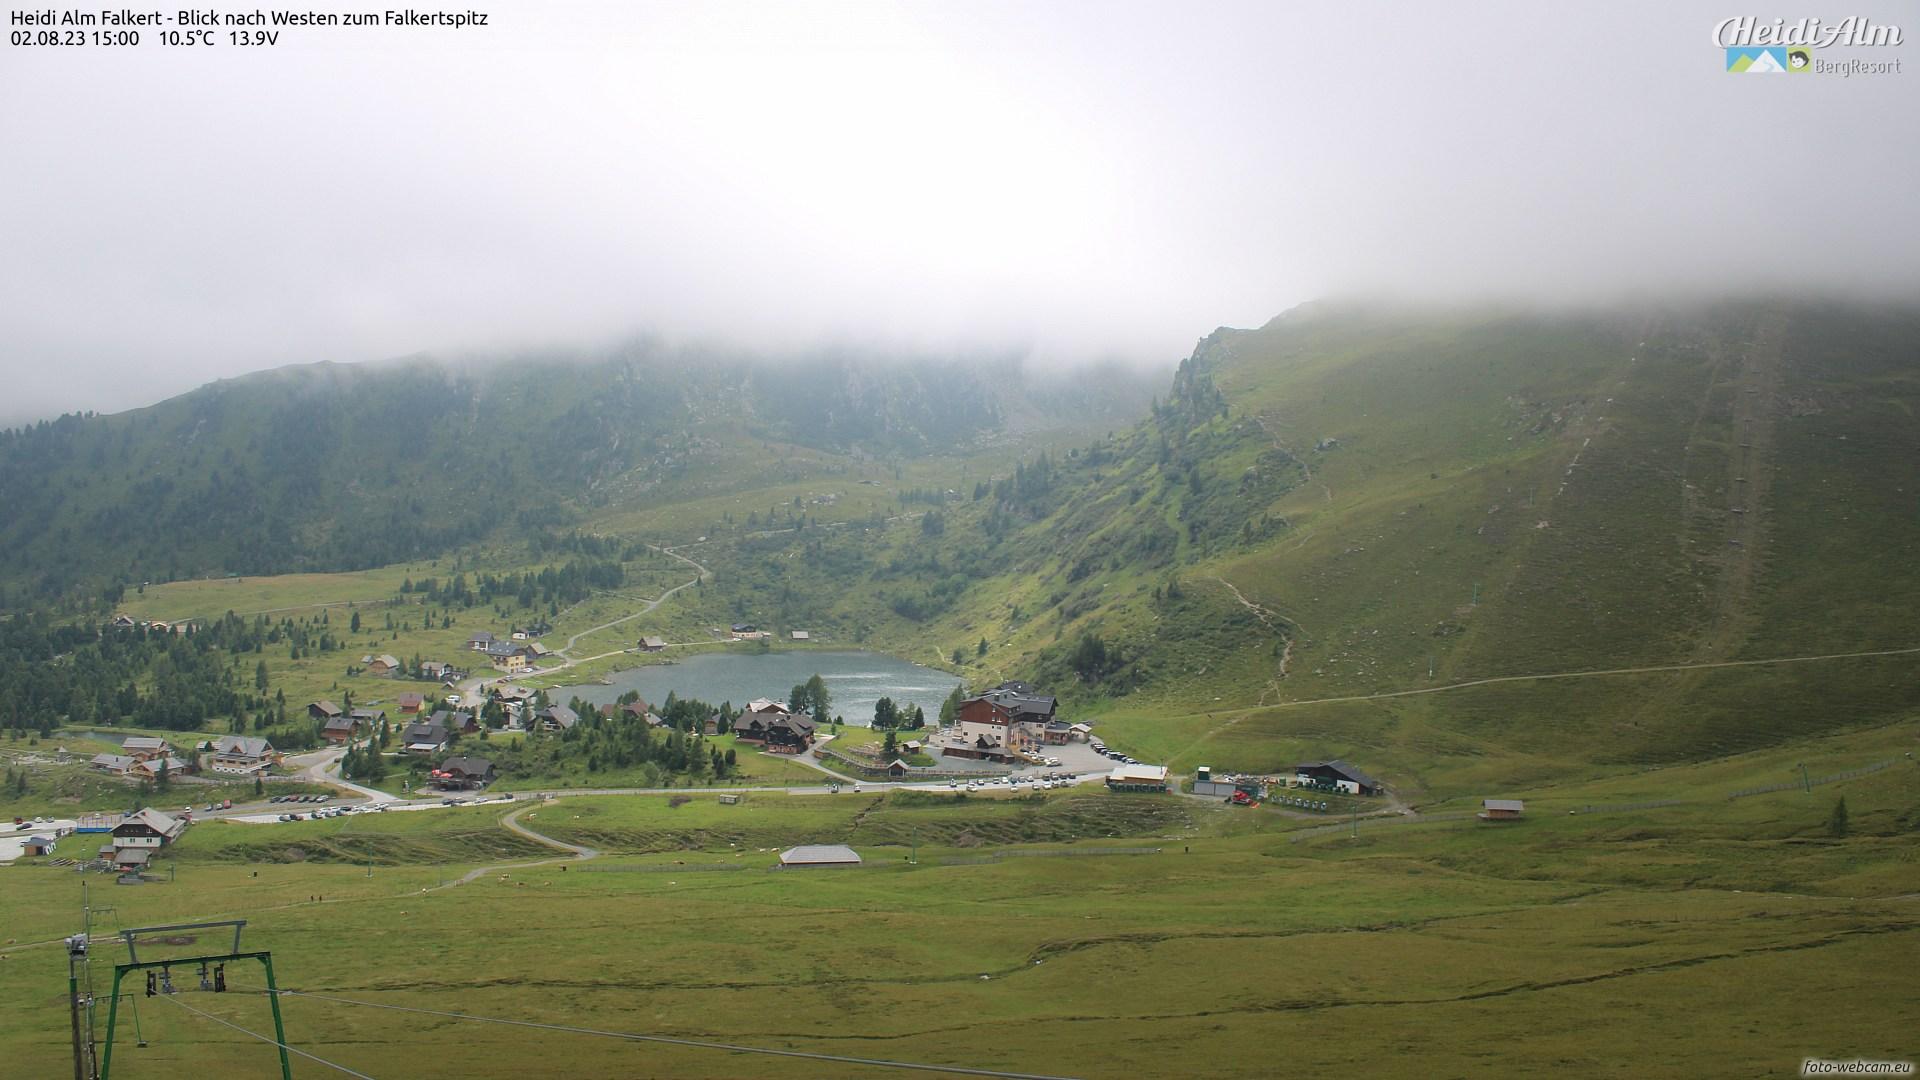 Klettersteig Falkert : Klettersteige falkert und rödresnock über falkensteig km